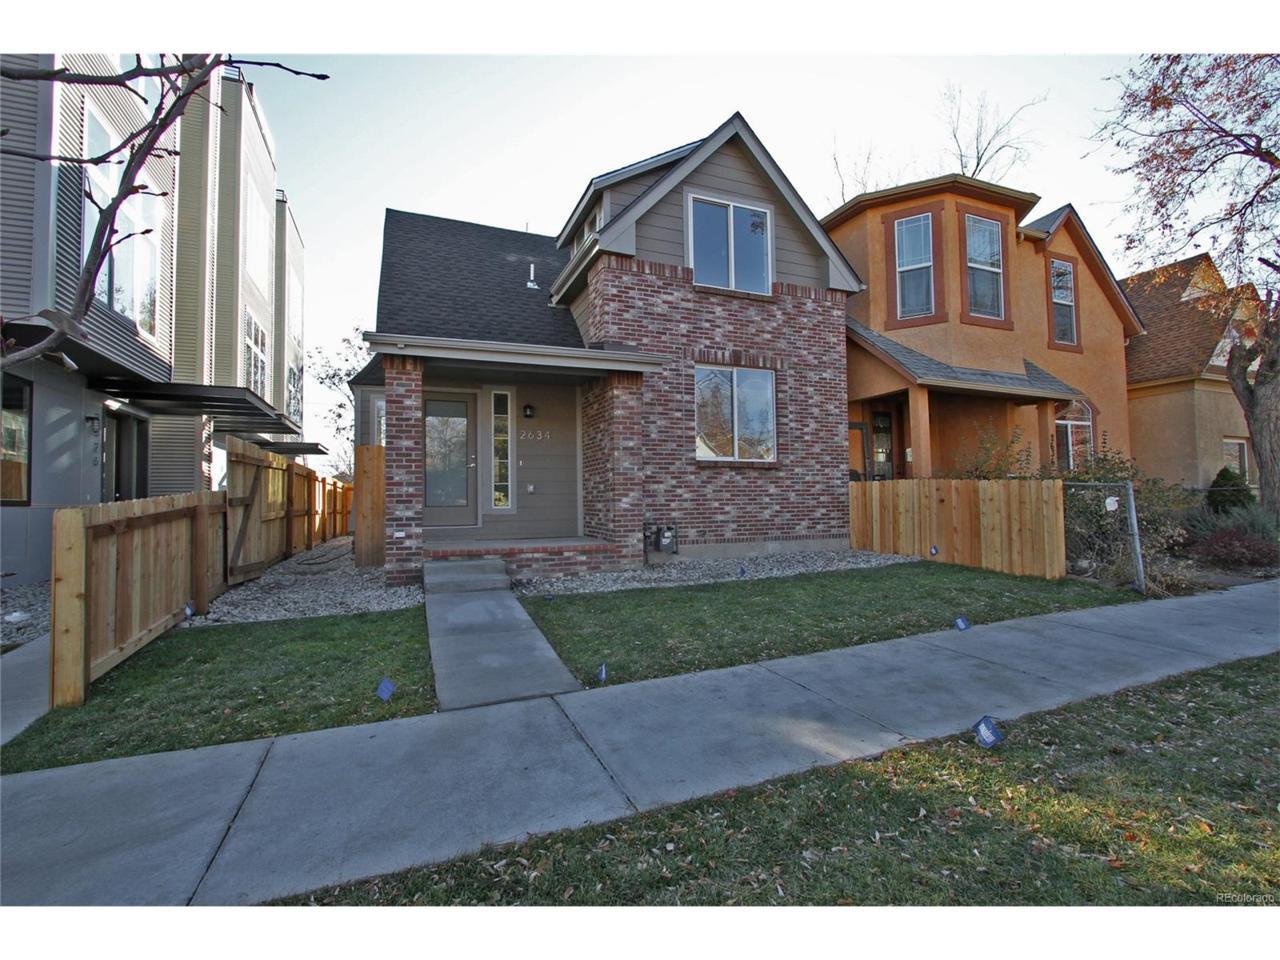 2634 W 27th Avenue, Denver, CO 80211 (MLS #7107998) :: 8z Real Estate